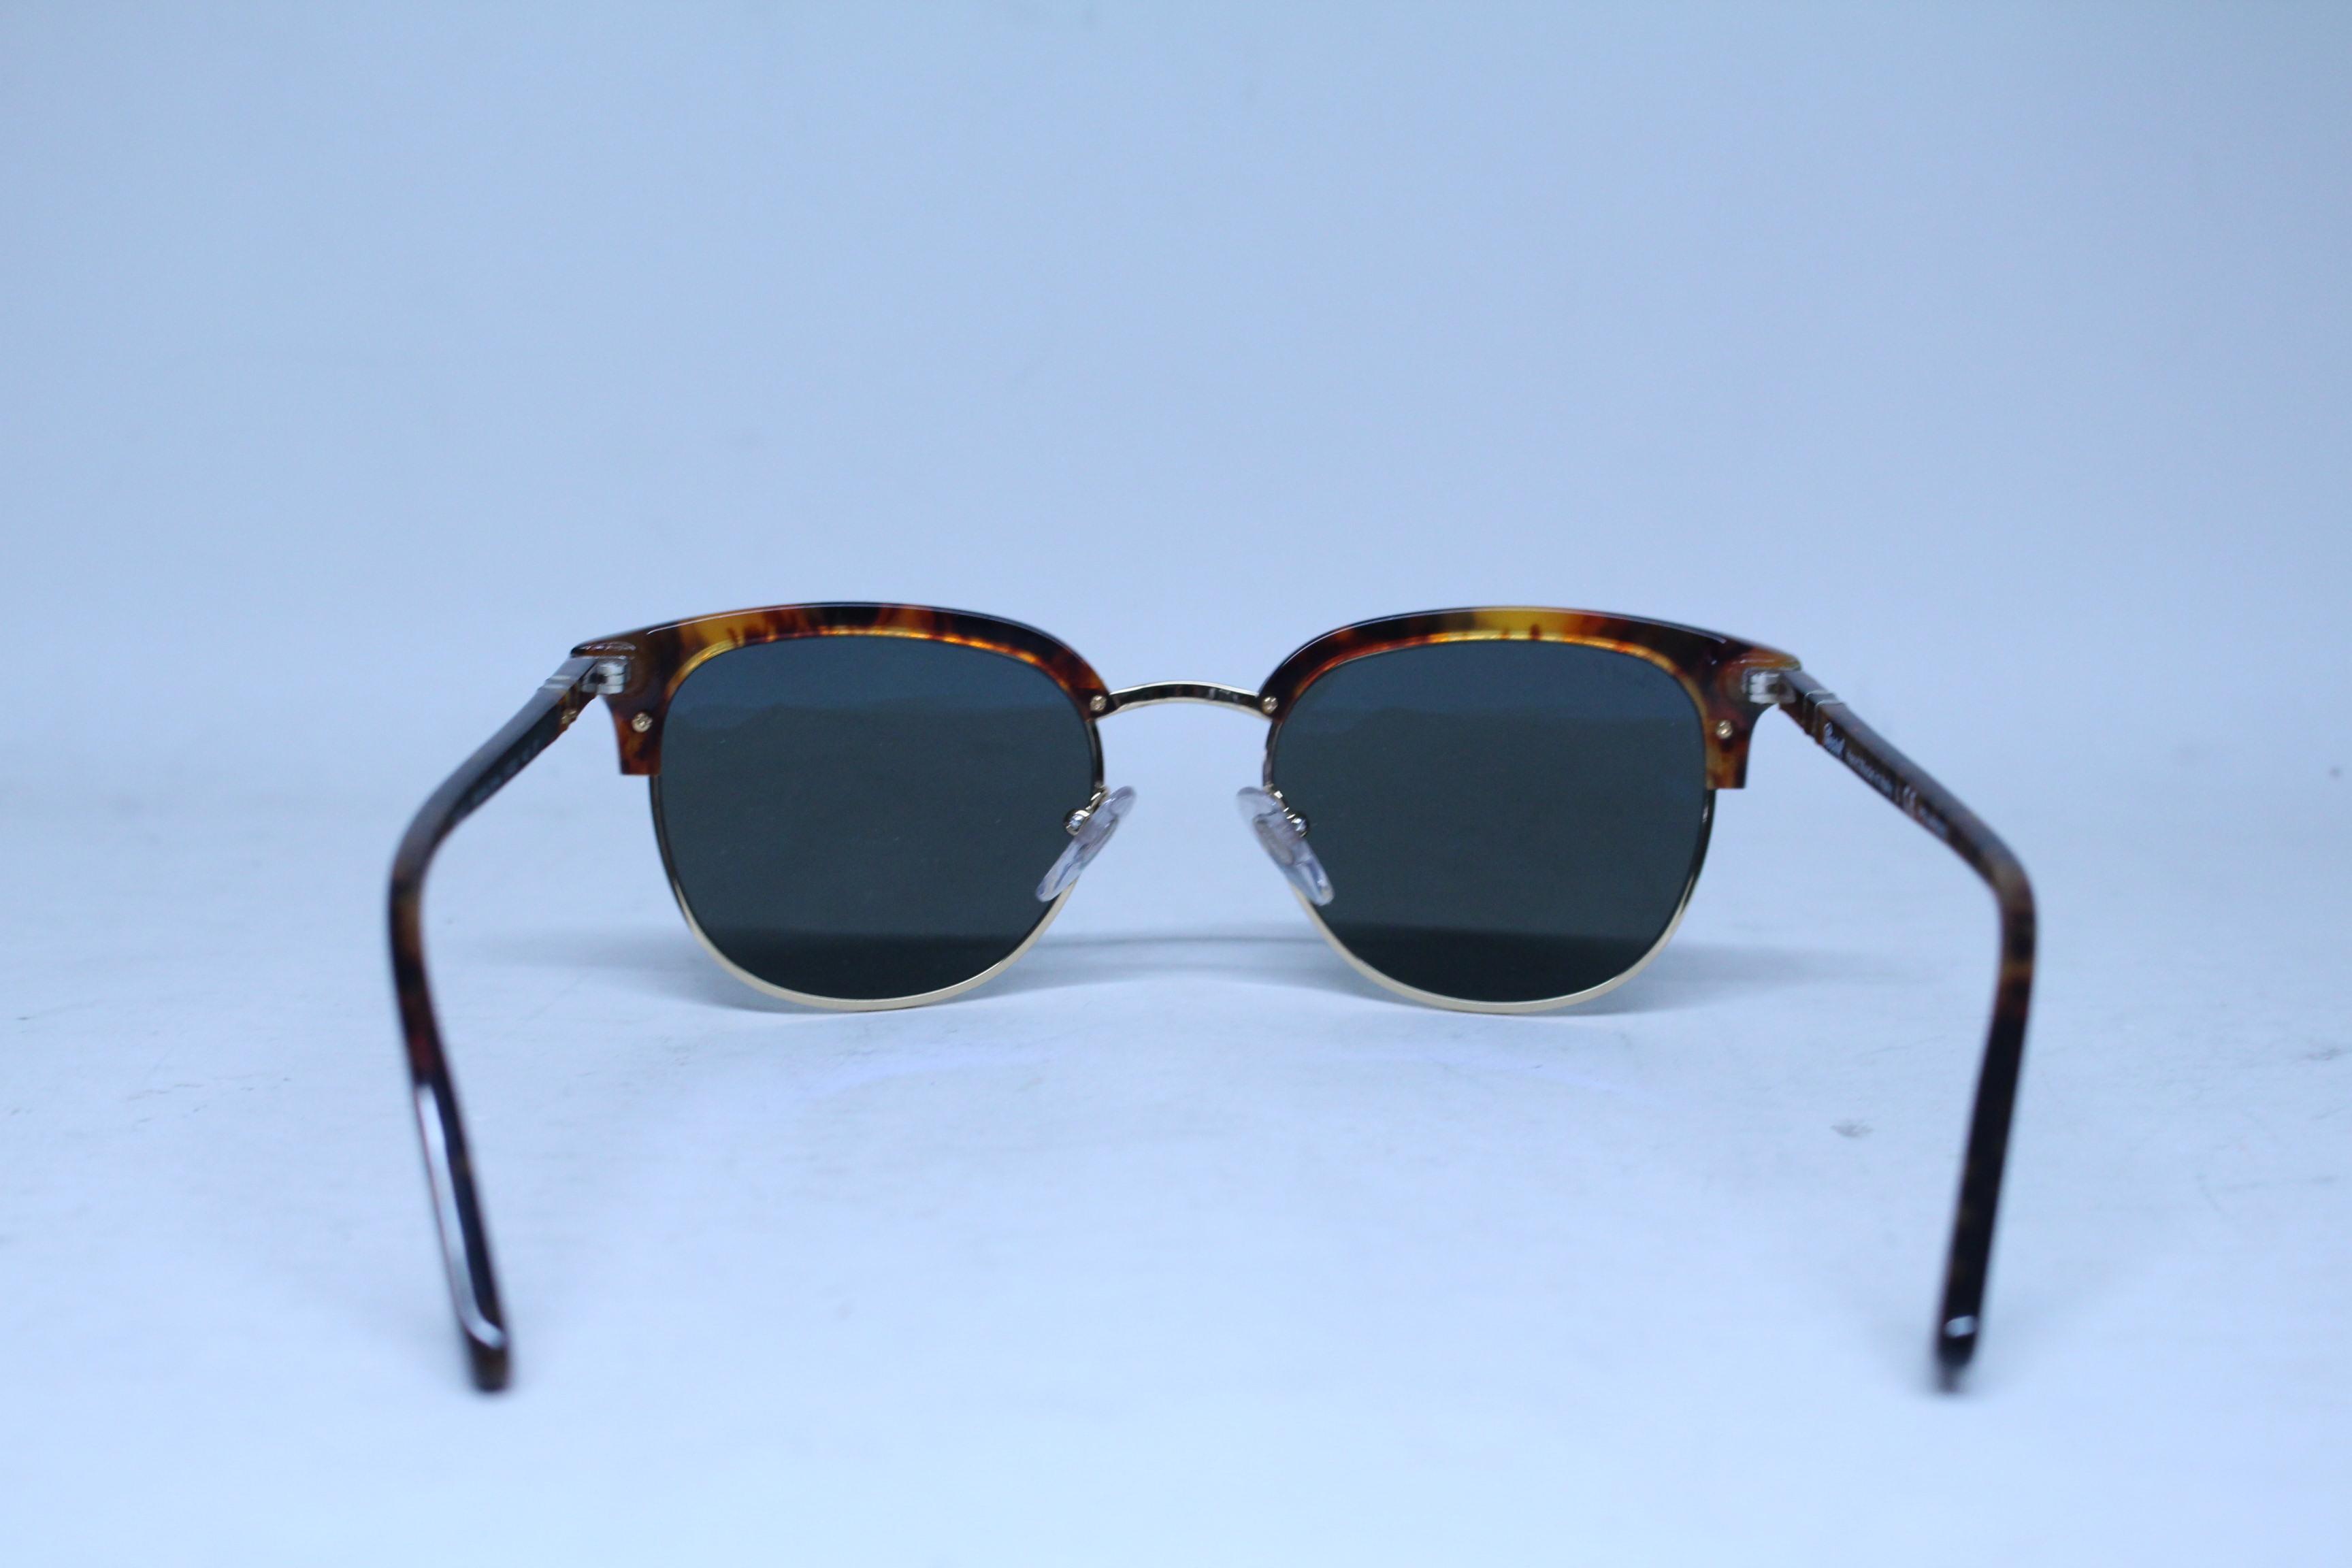 02f9cb6a9e1 Details about Persol 3105-S 108 58 Sunglasses Frames - Caffe - 51 20 145